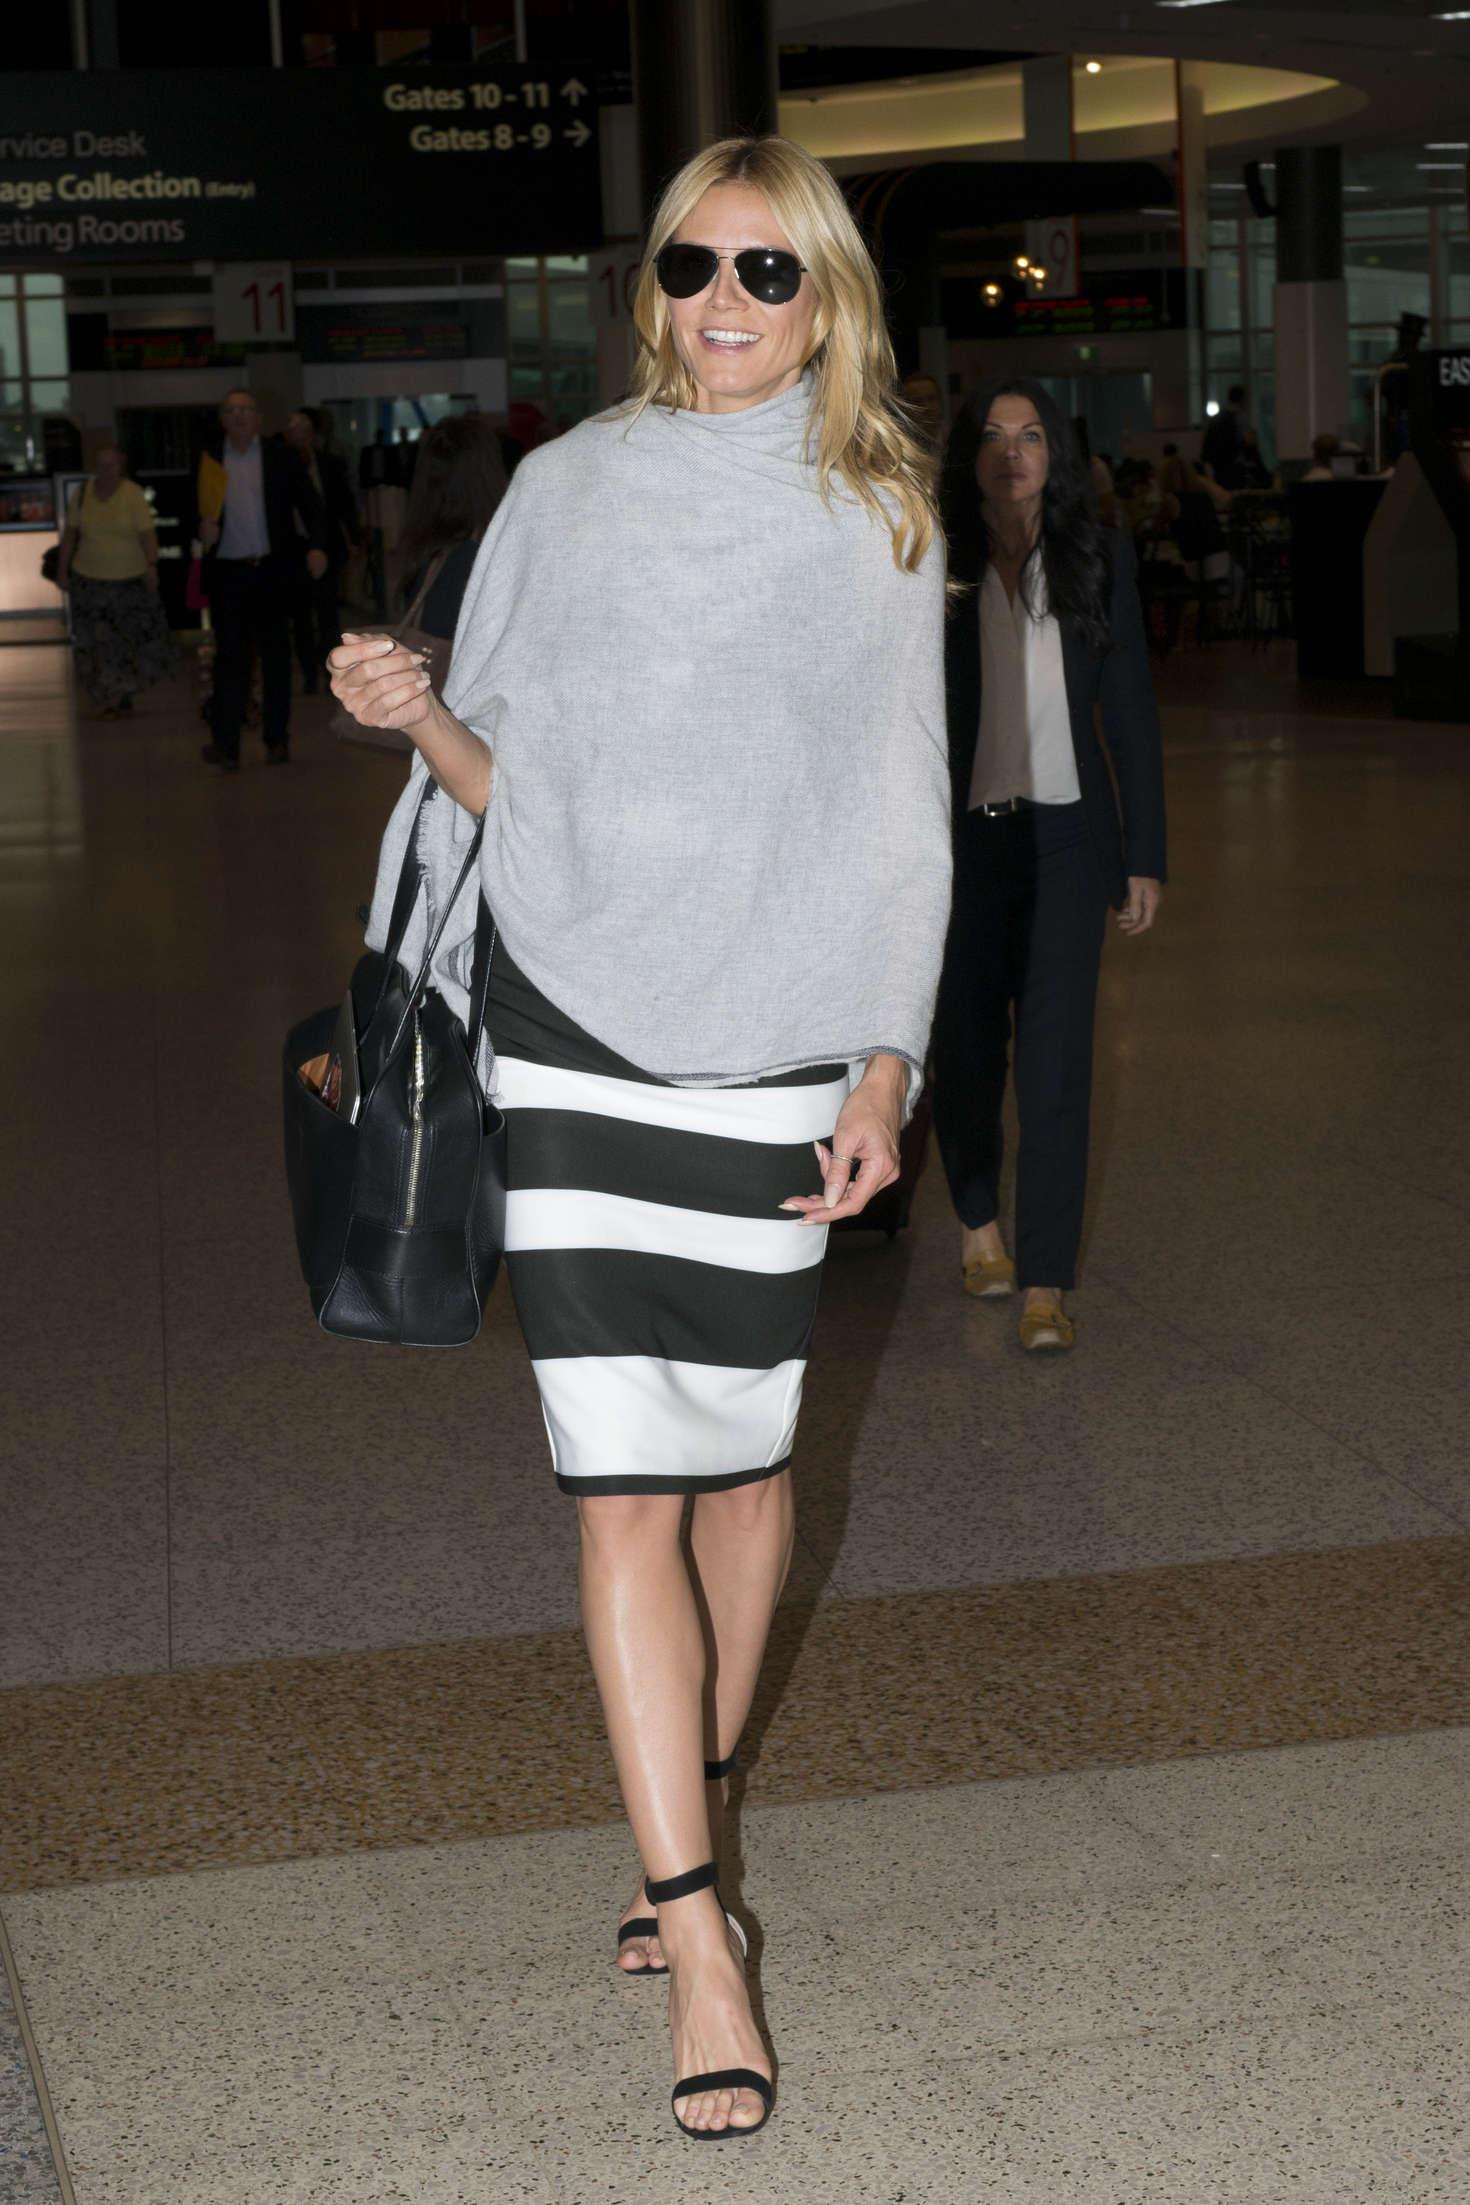 Heidi Klum 2016 : Heidi Klum Arrives at Sydney Airport -05